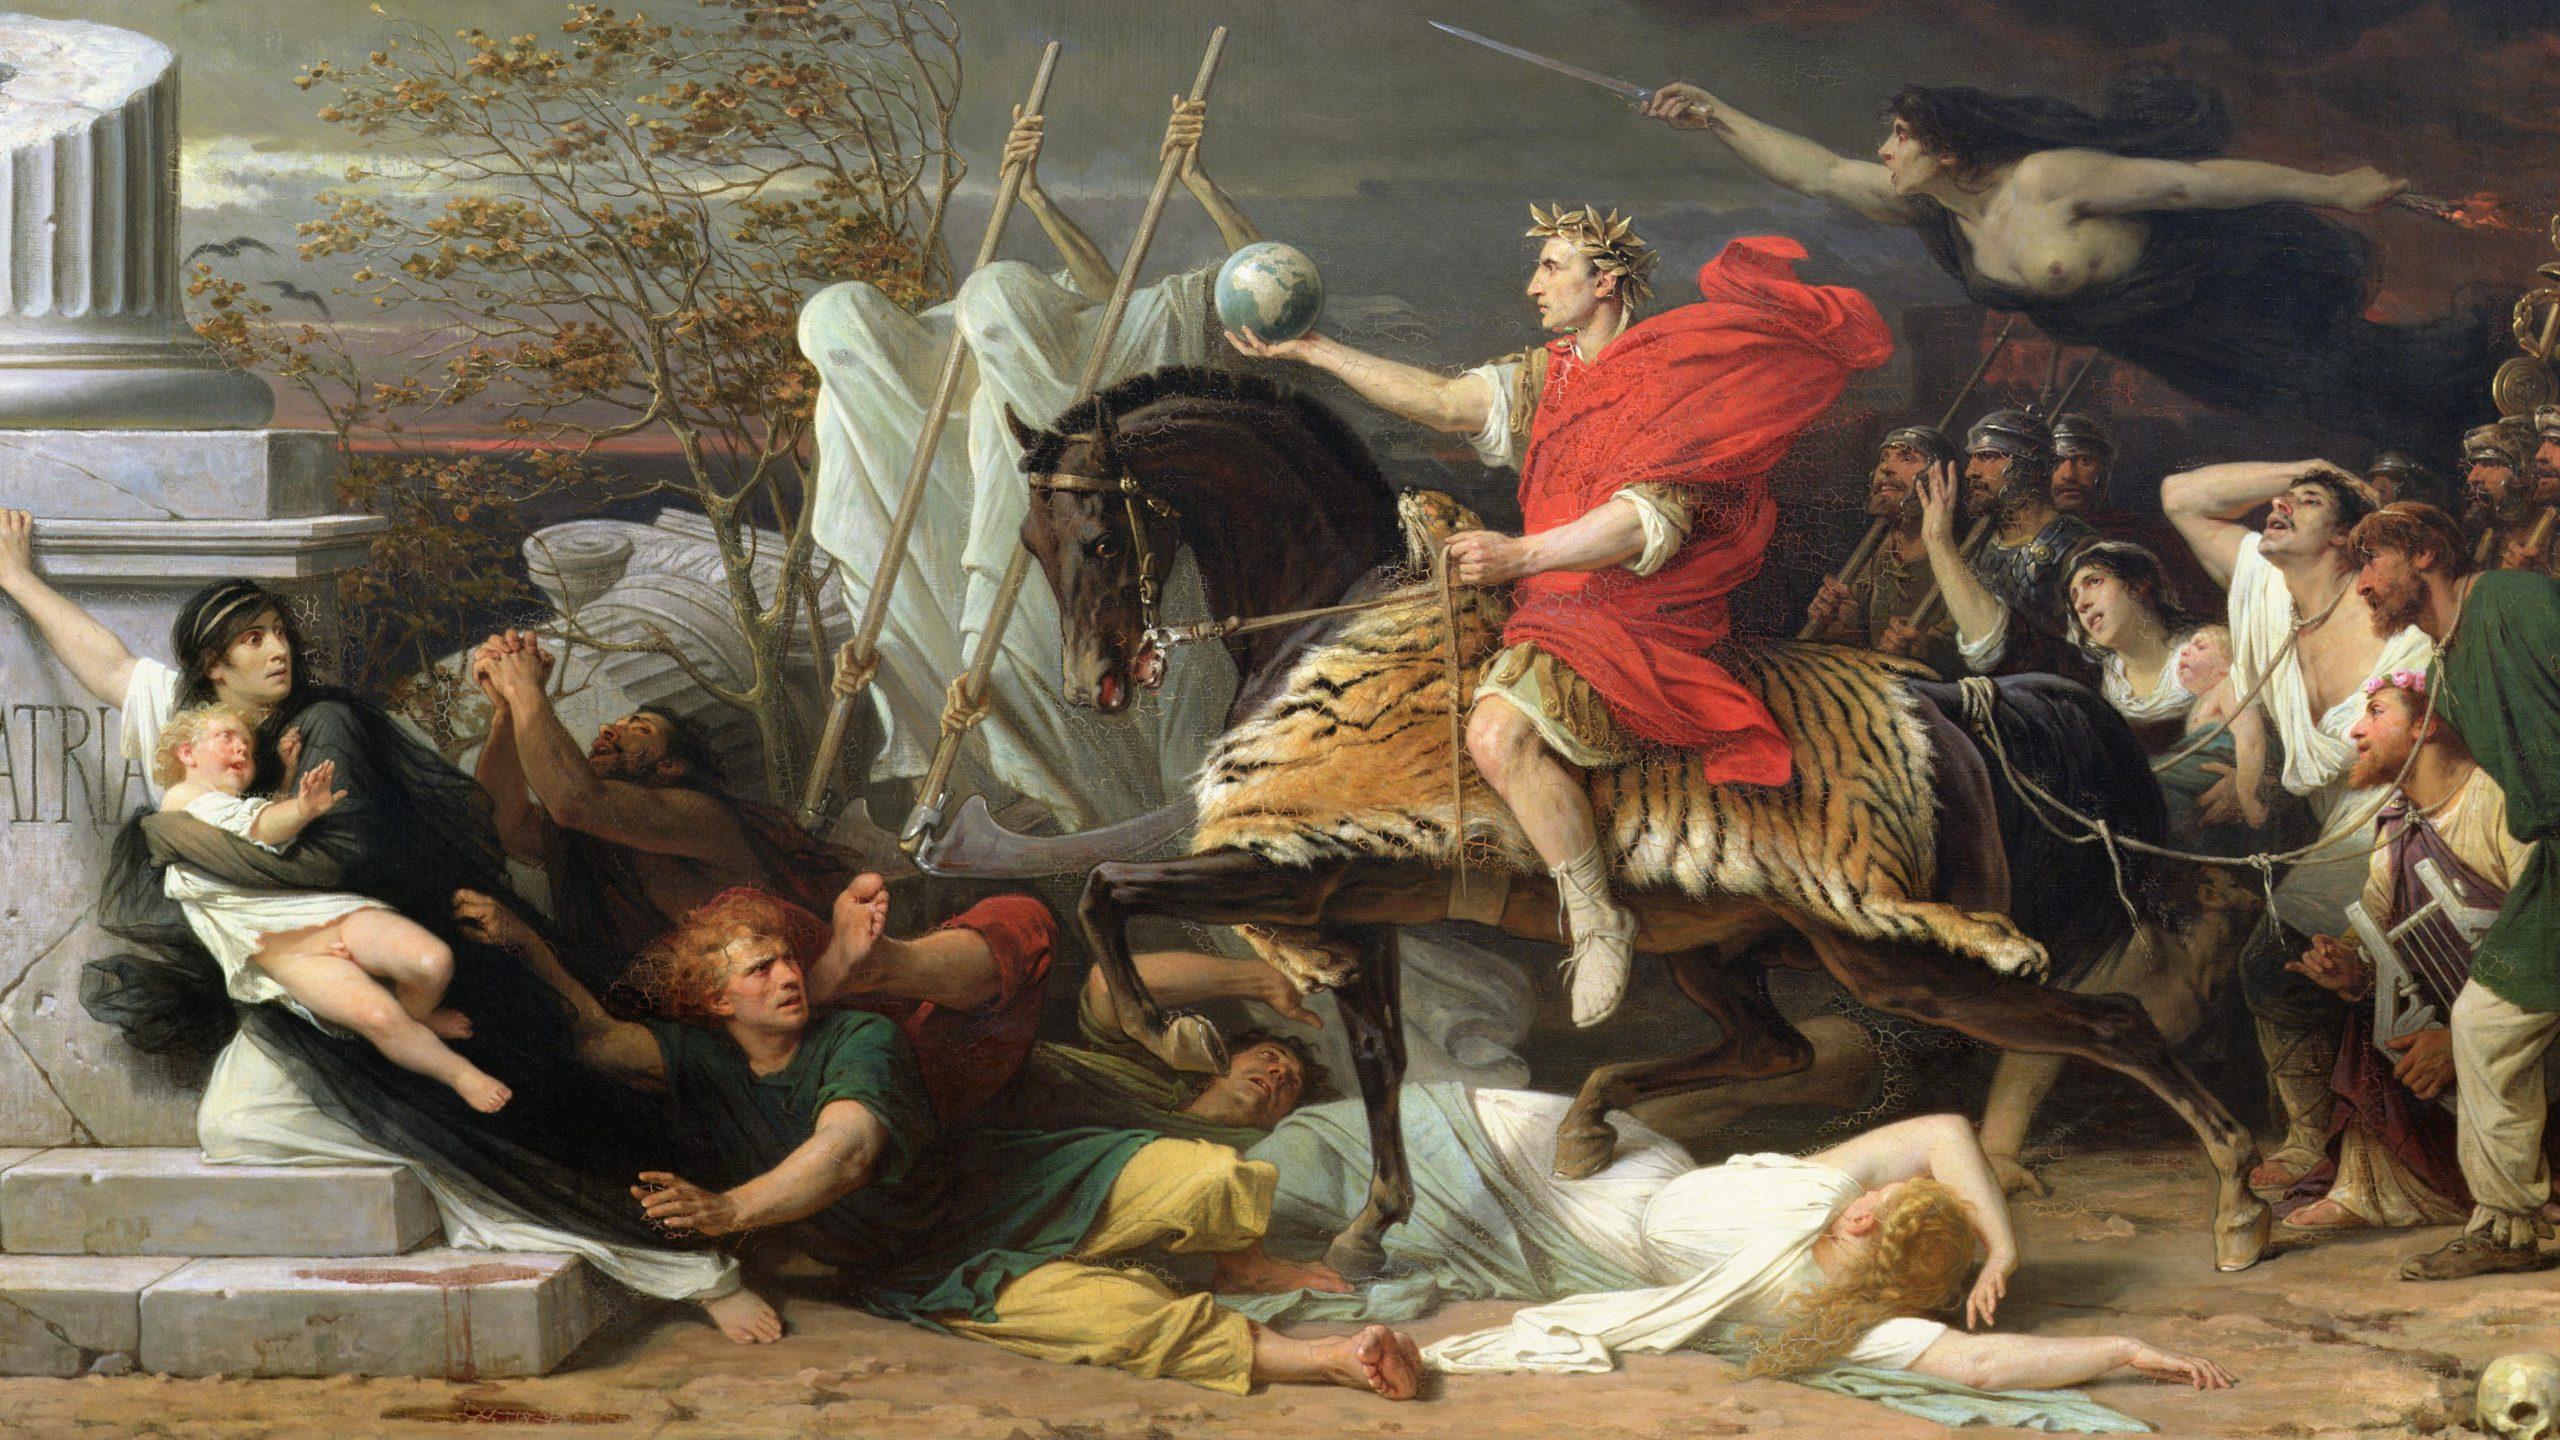 The Pharsalia by Lucan: Epic Poem on the Roman Civil War